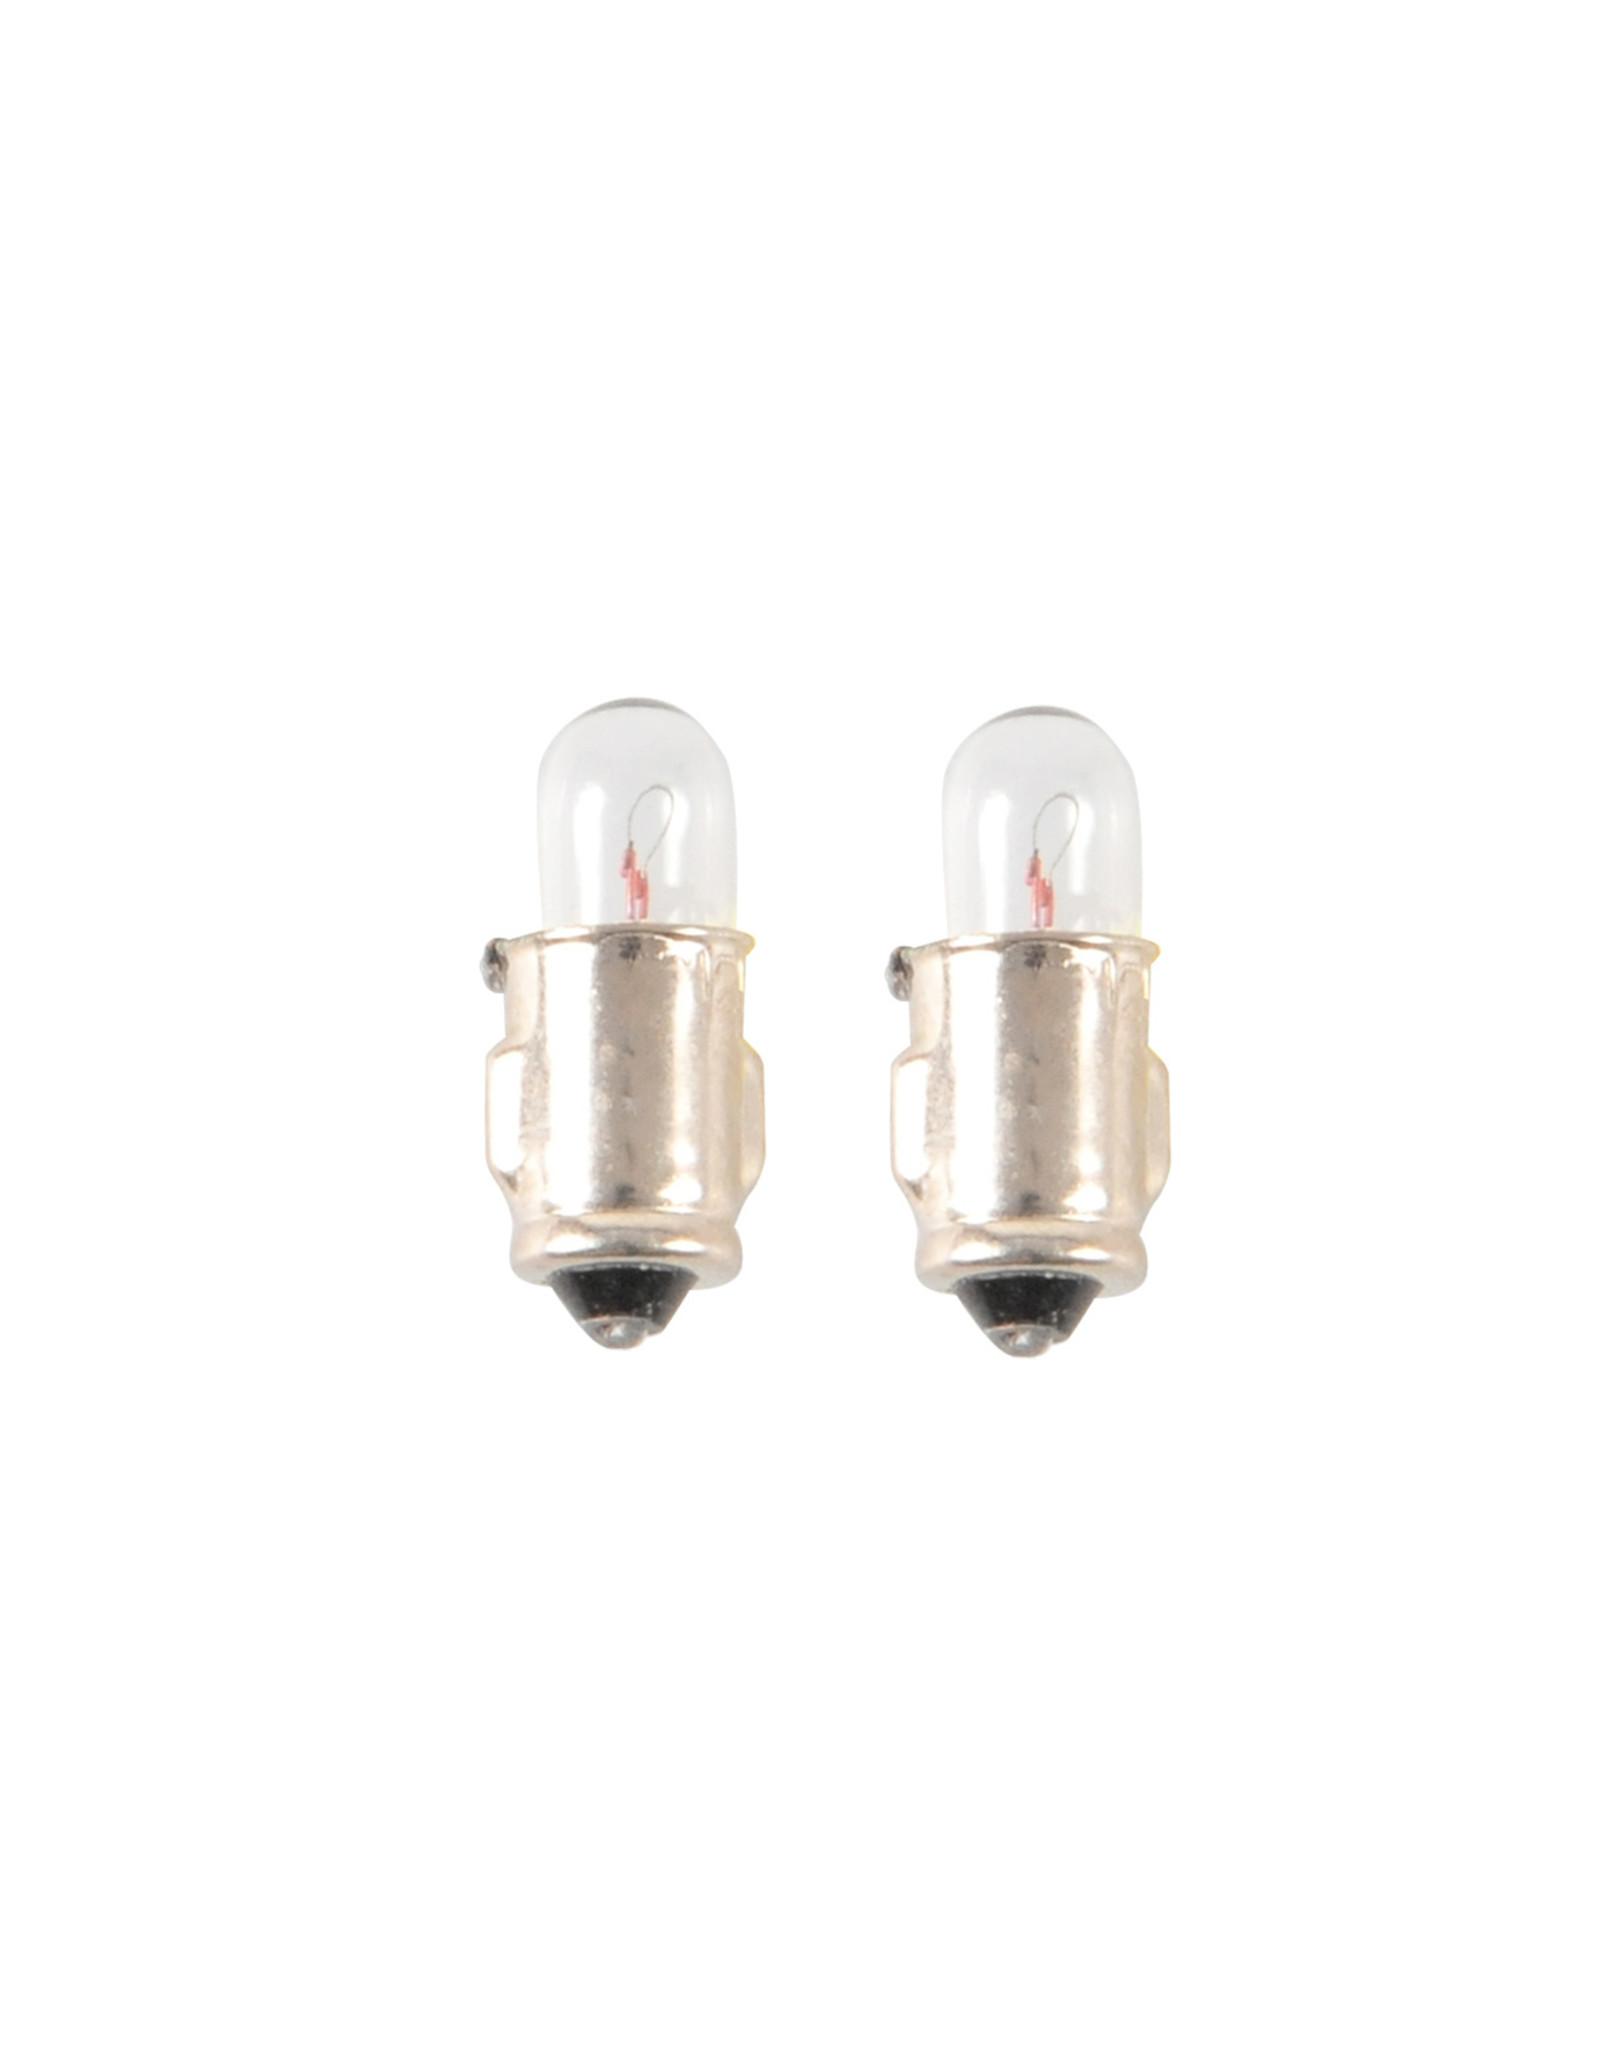 Autolamp 12V 2W BA7s 2x